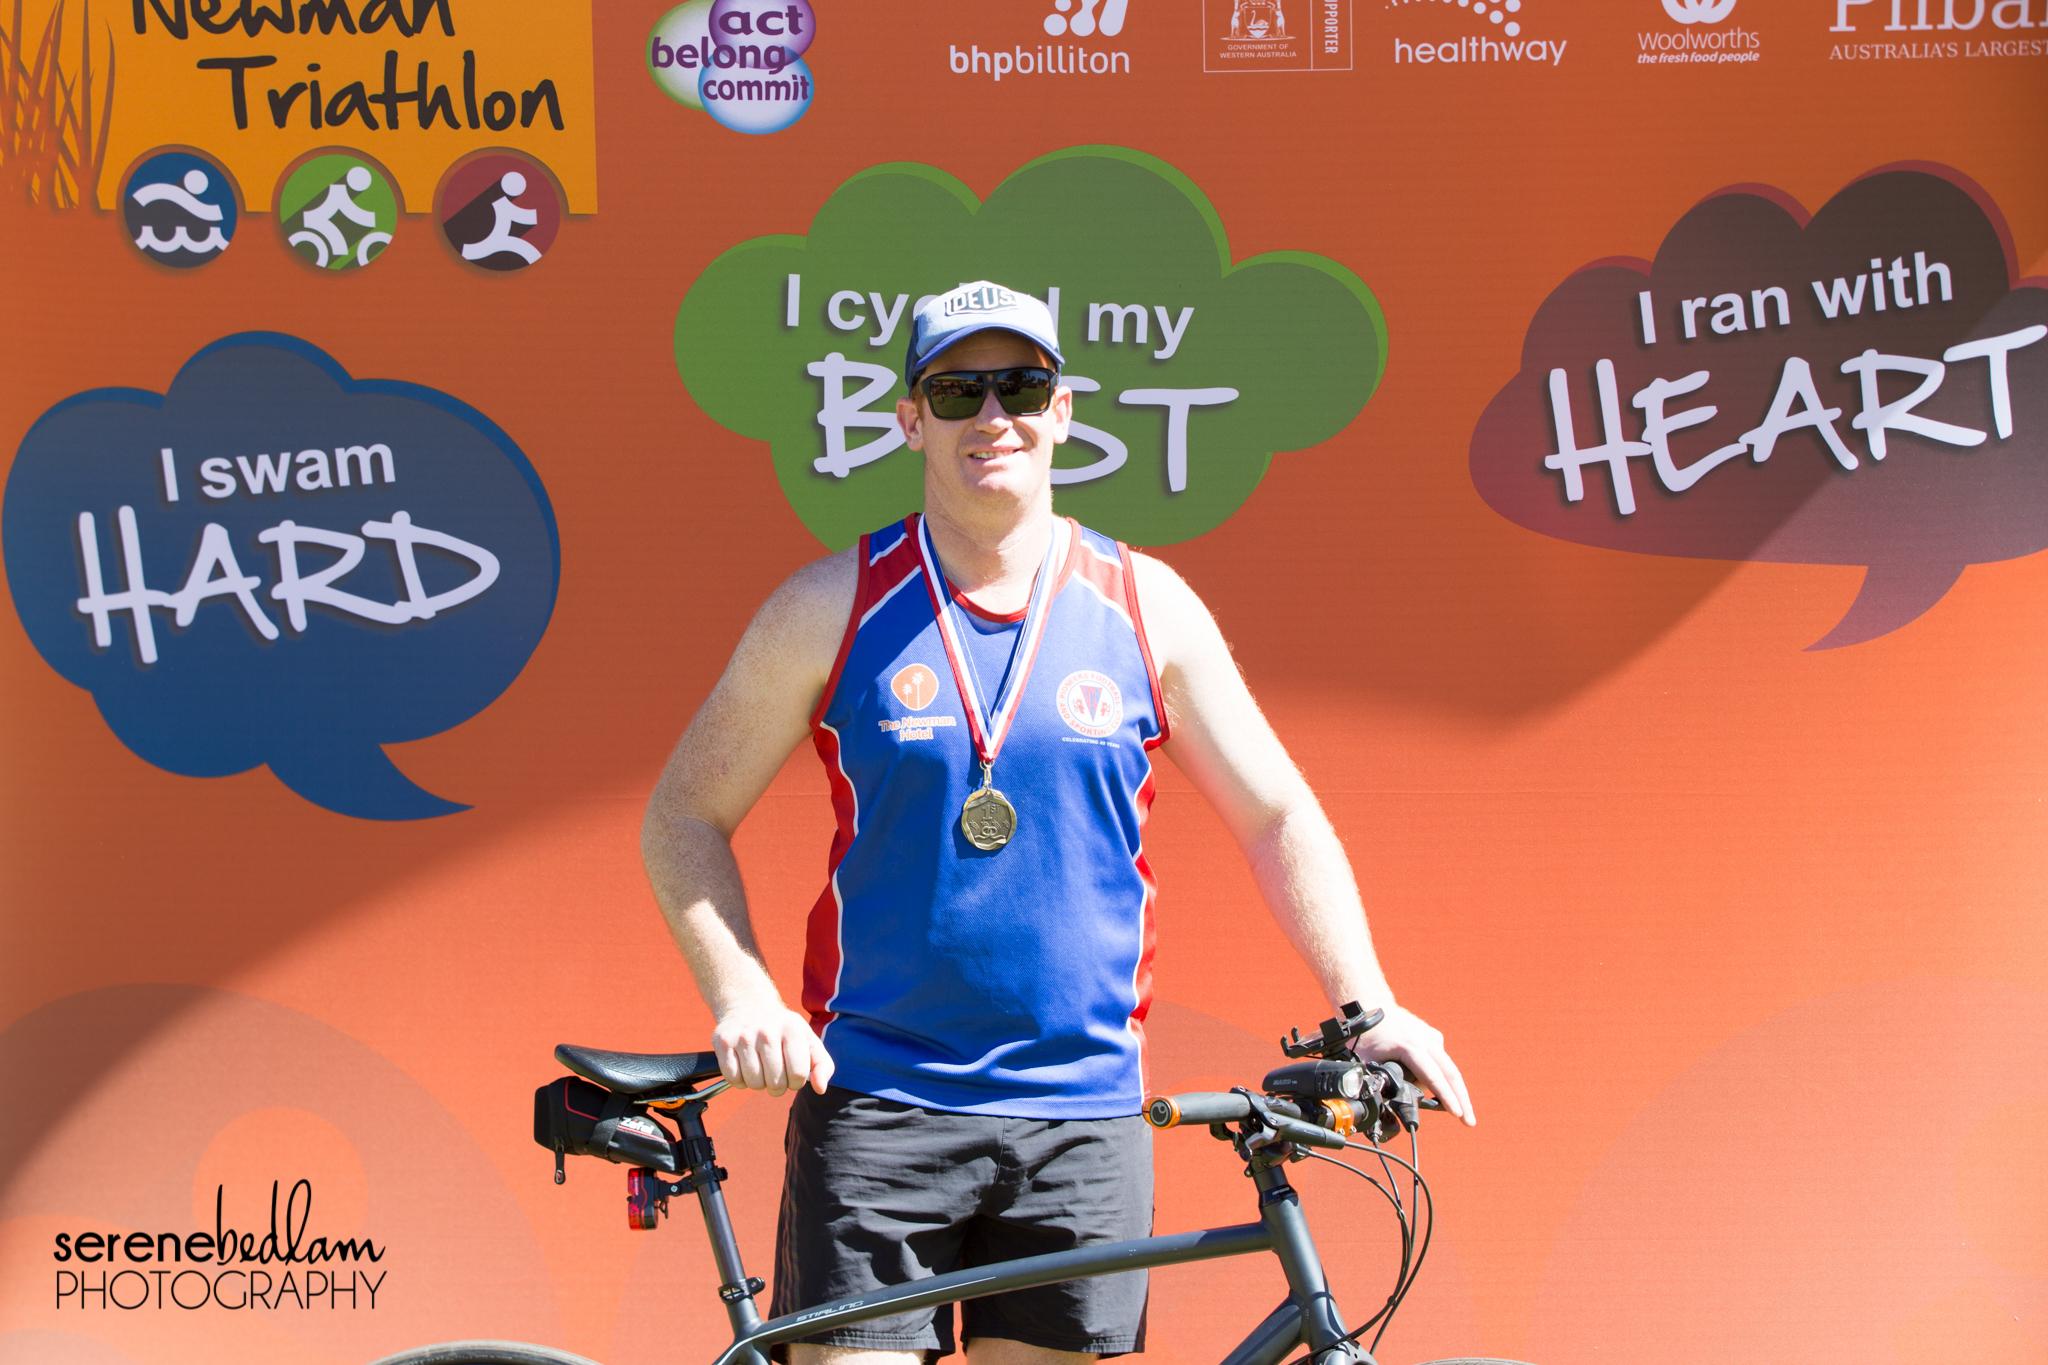 Newman Triathlon Event Photography